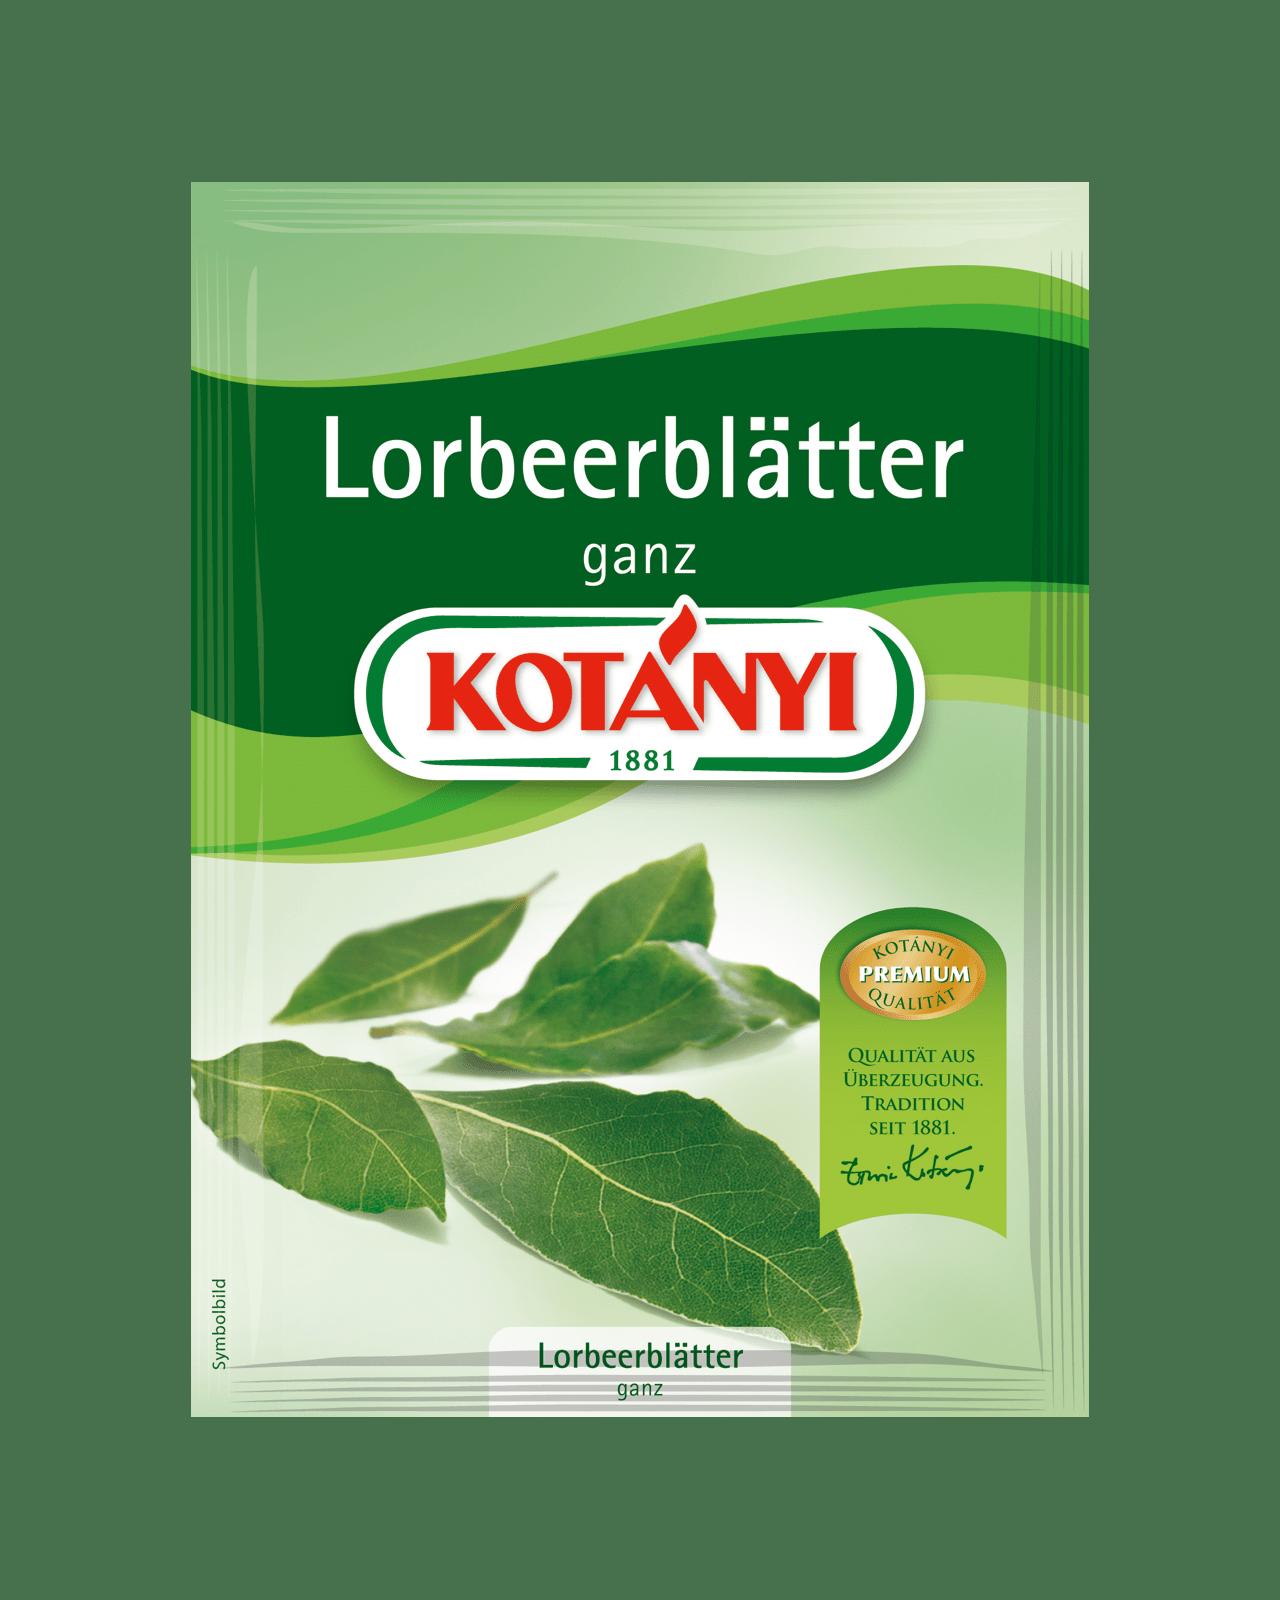 Kotányi Lorbeerblätter ganz im Brief